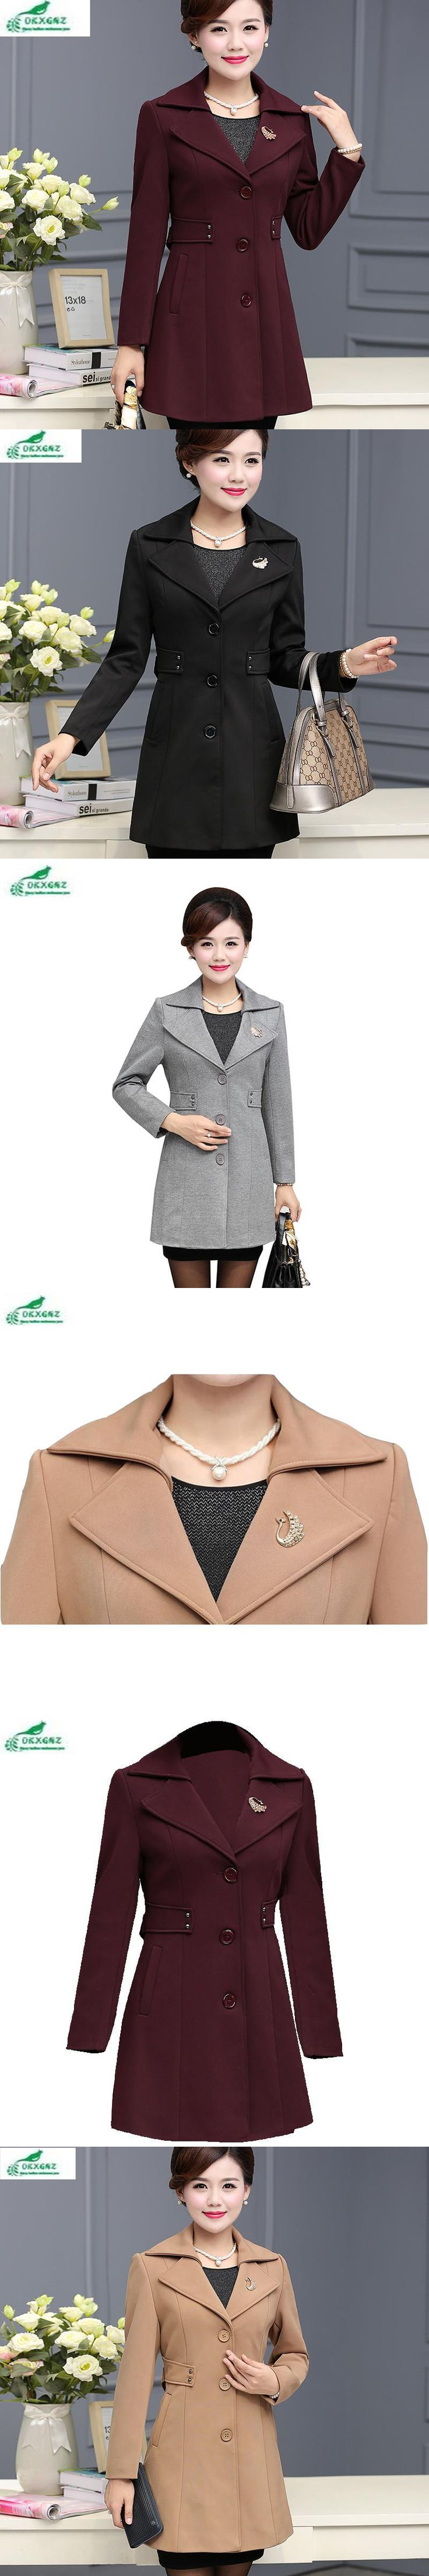 Autumn in the elderly Women's windbreaker fashion in the long section of large size XL-4XL new spring coat female OKXGNZ QQ883